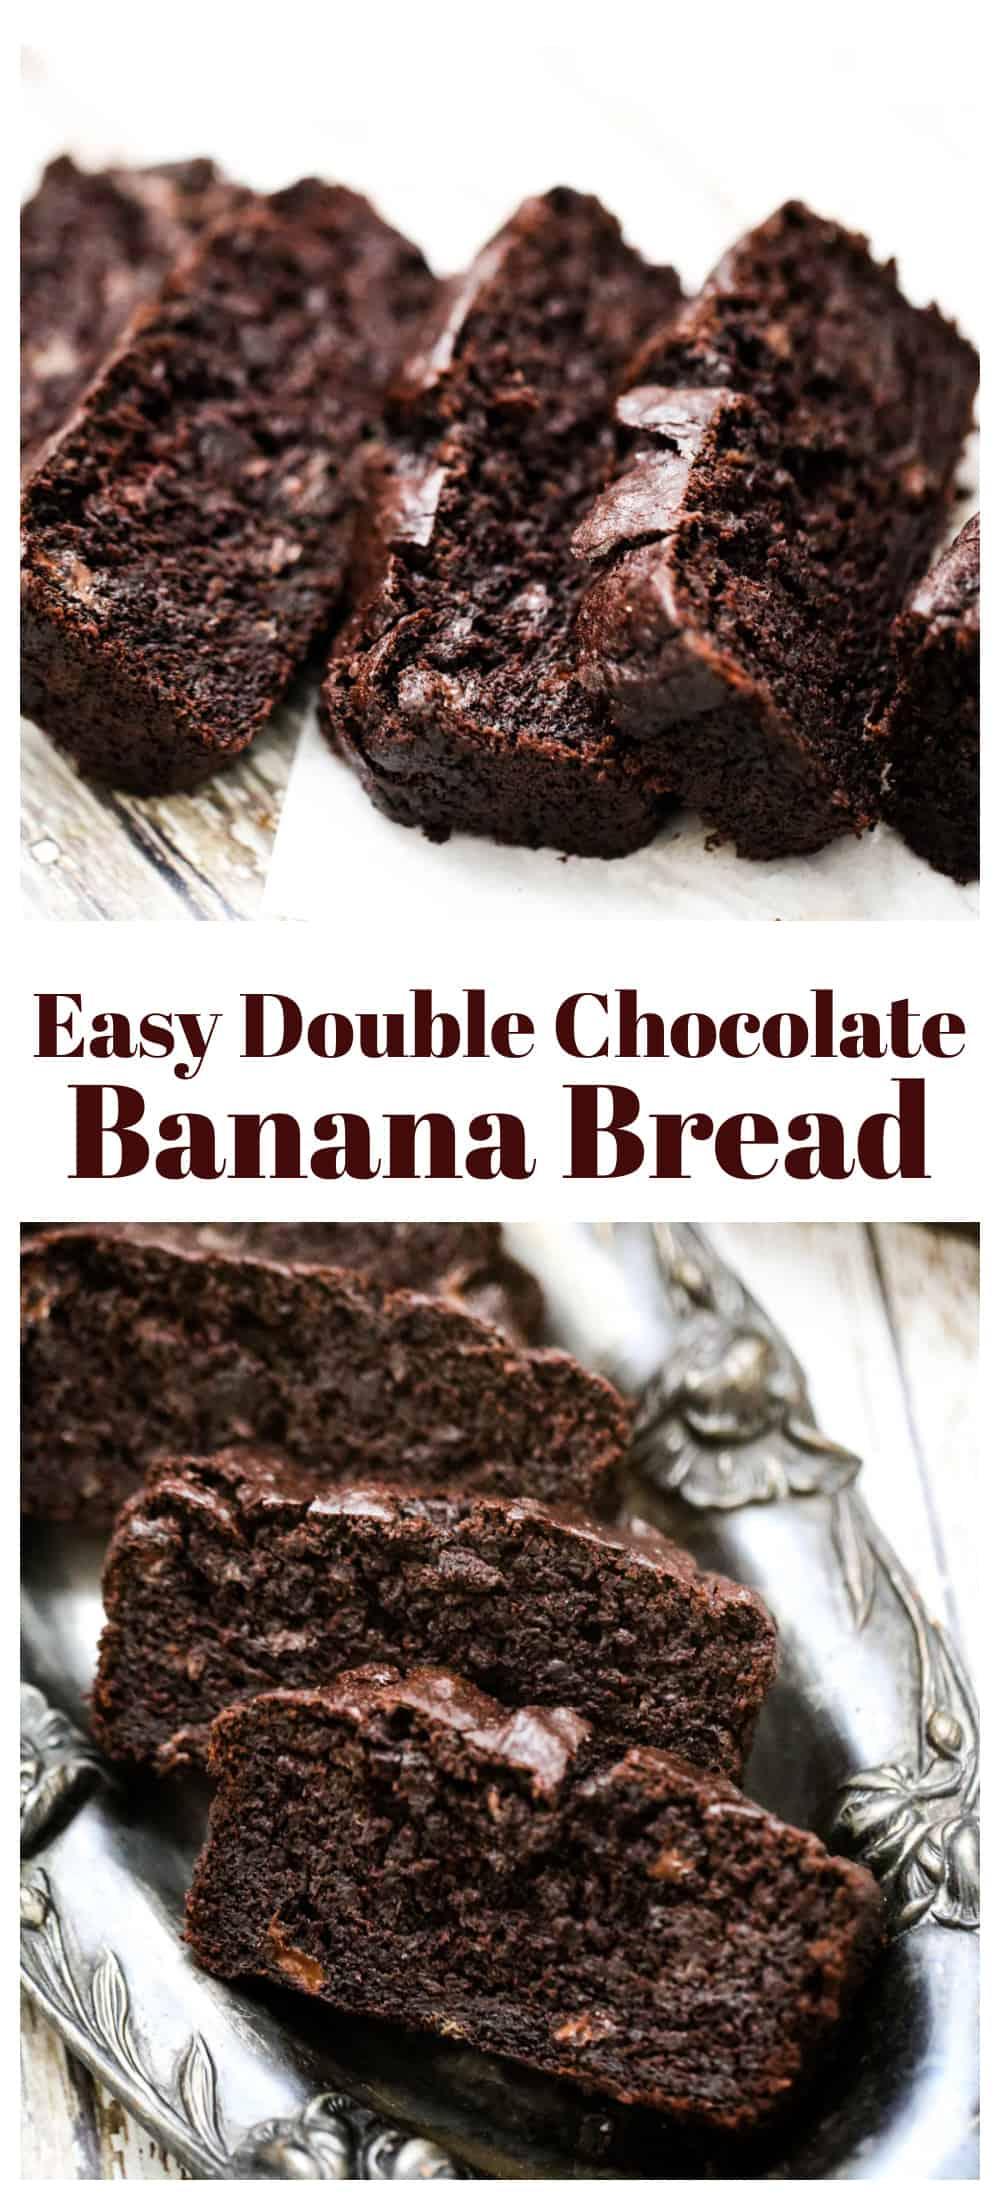 Easy Double Chocolate Banana Bread